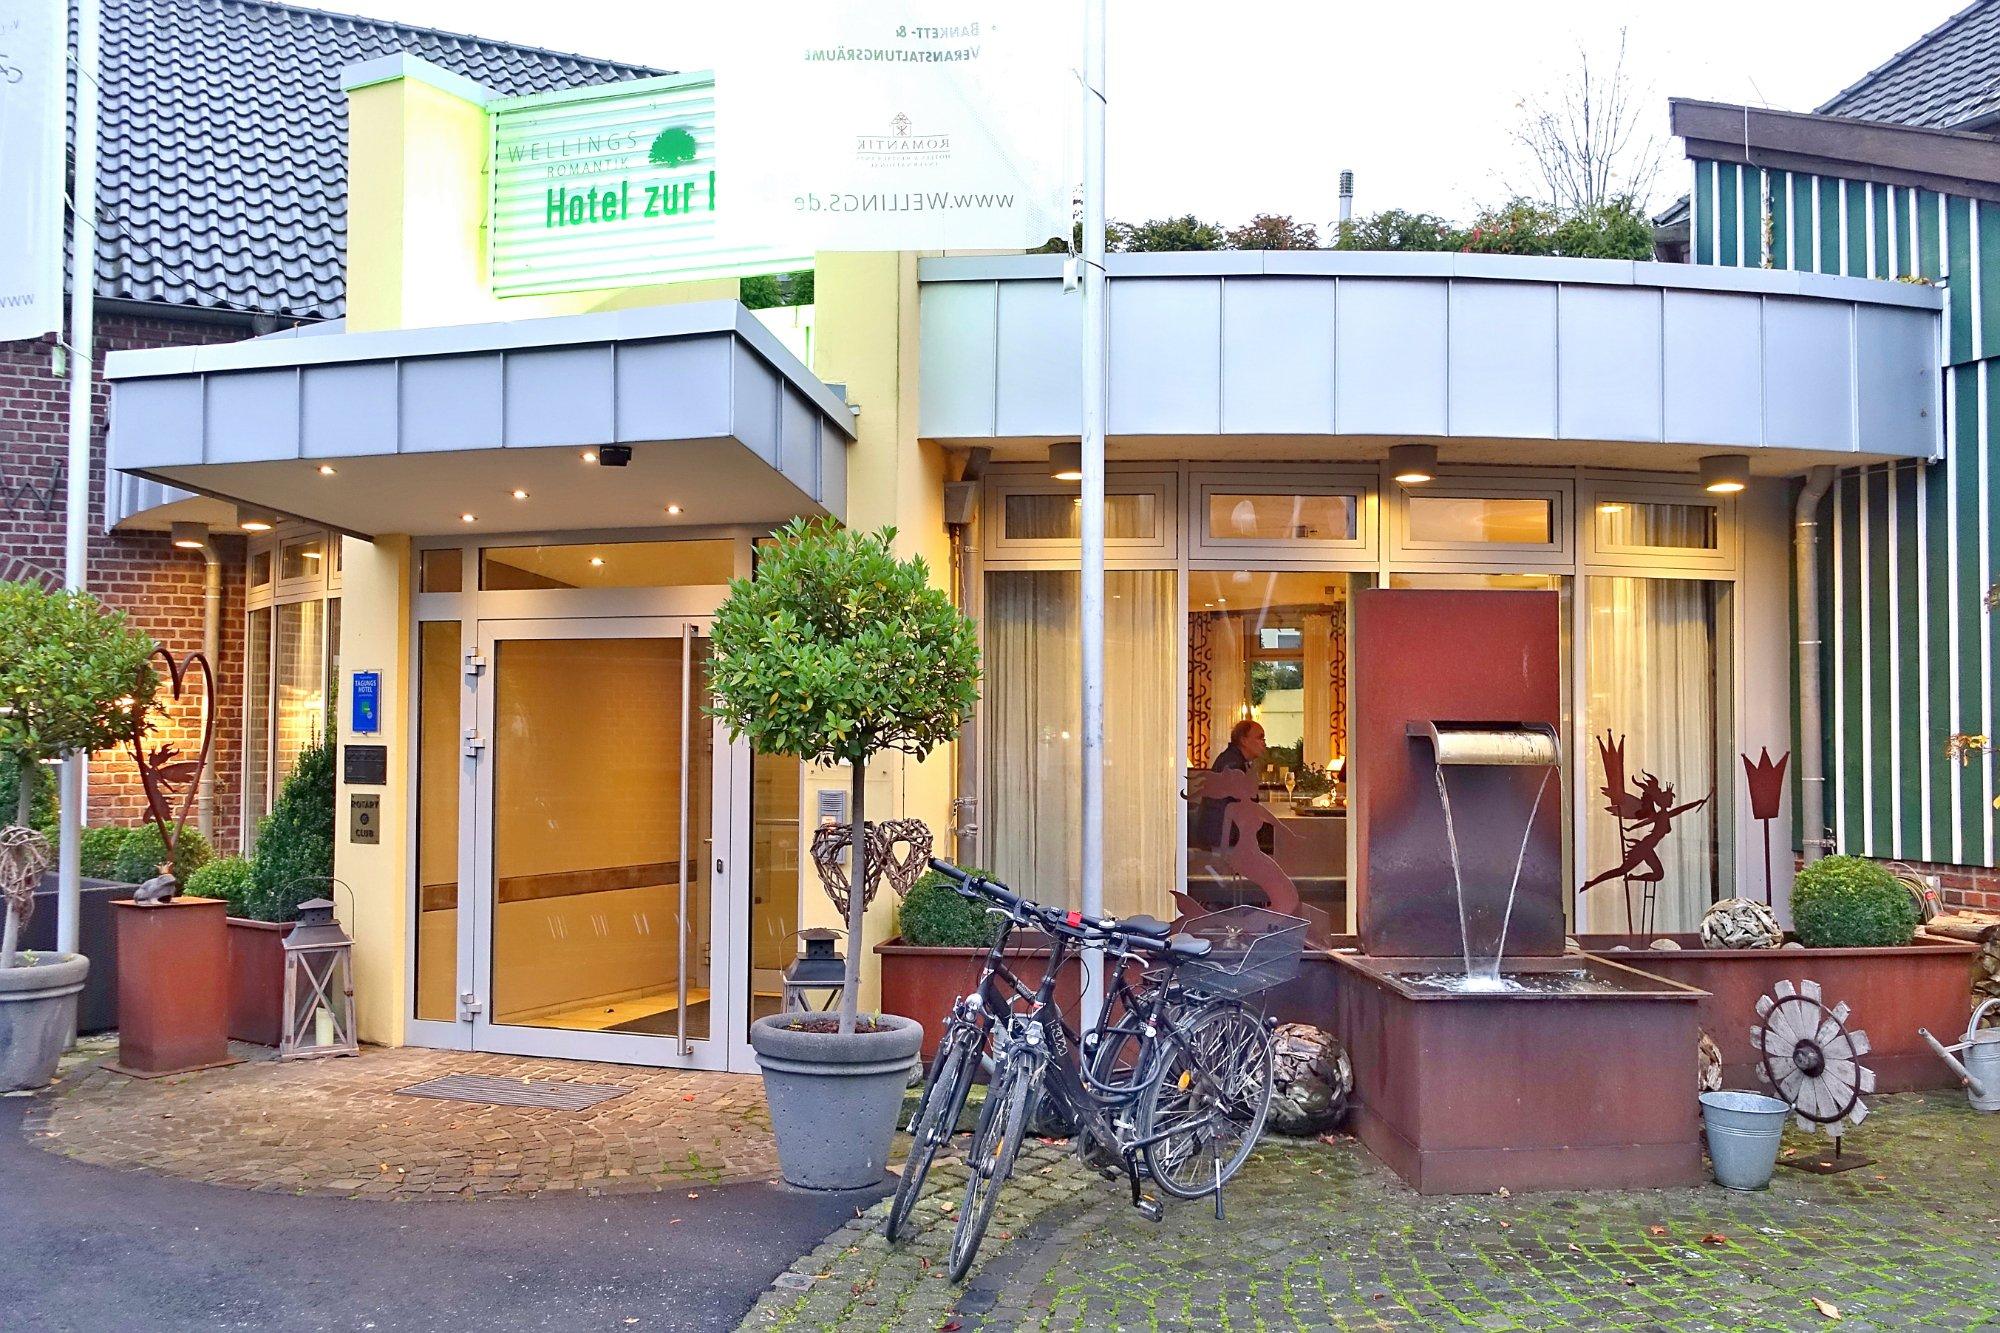 Wellings Romantik Hotel zur Linde